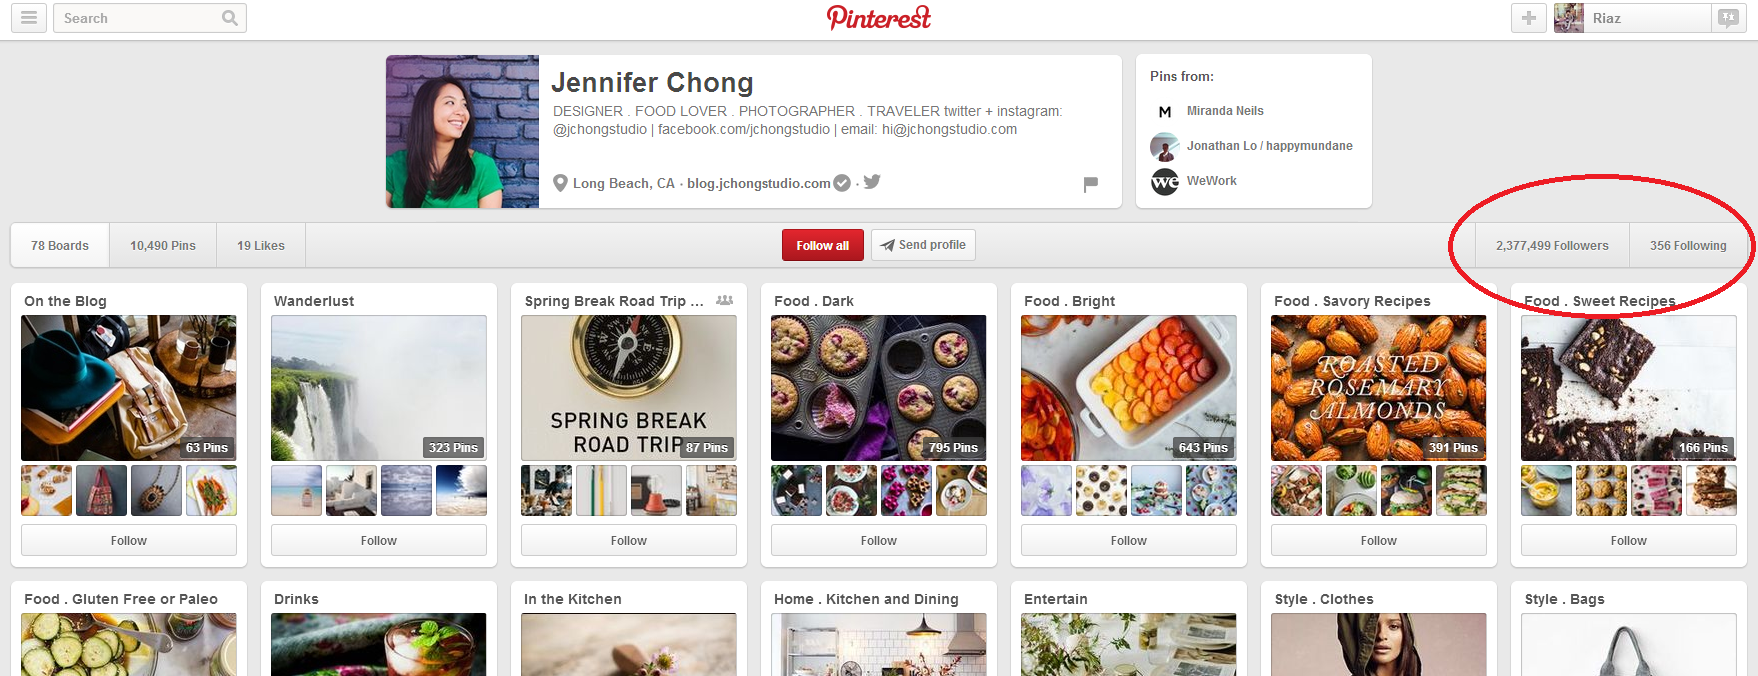 Jennifer Chong's Pinterest Account